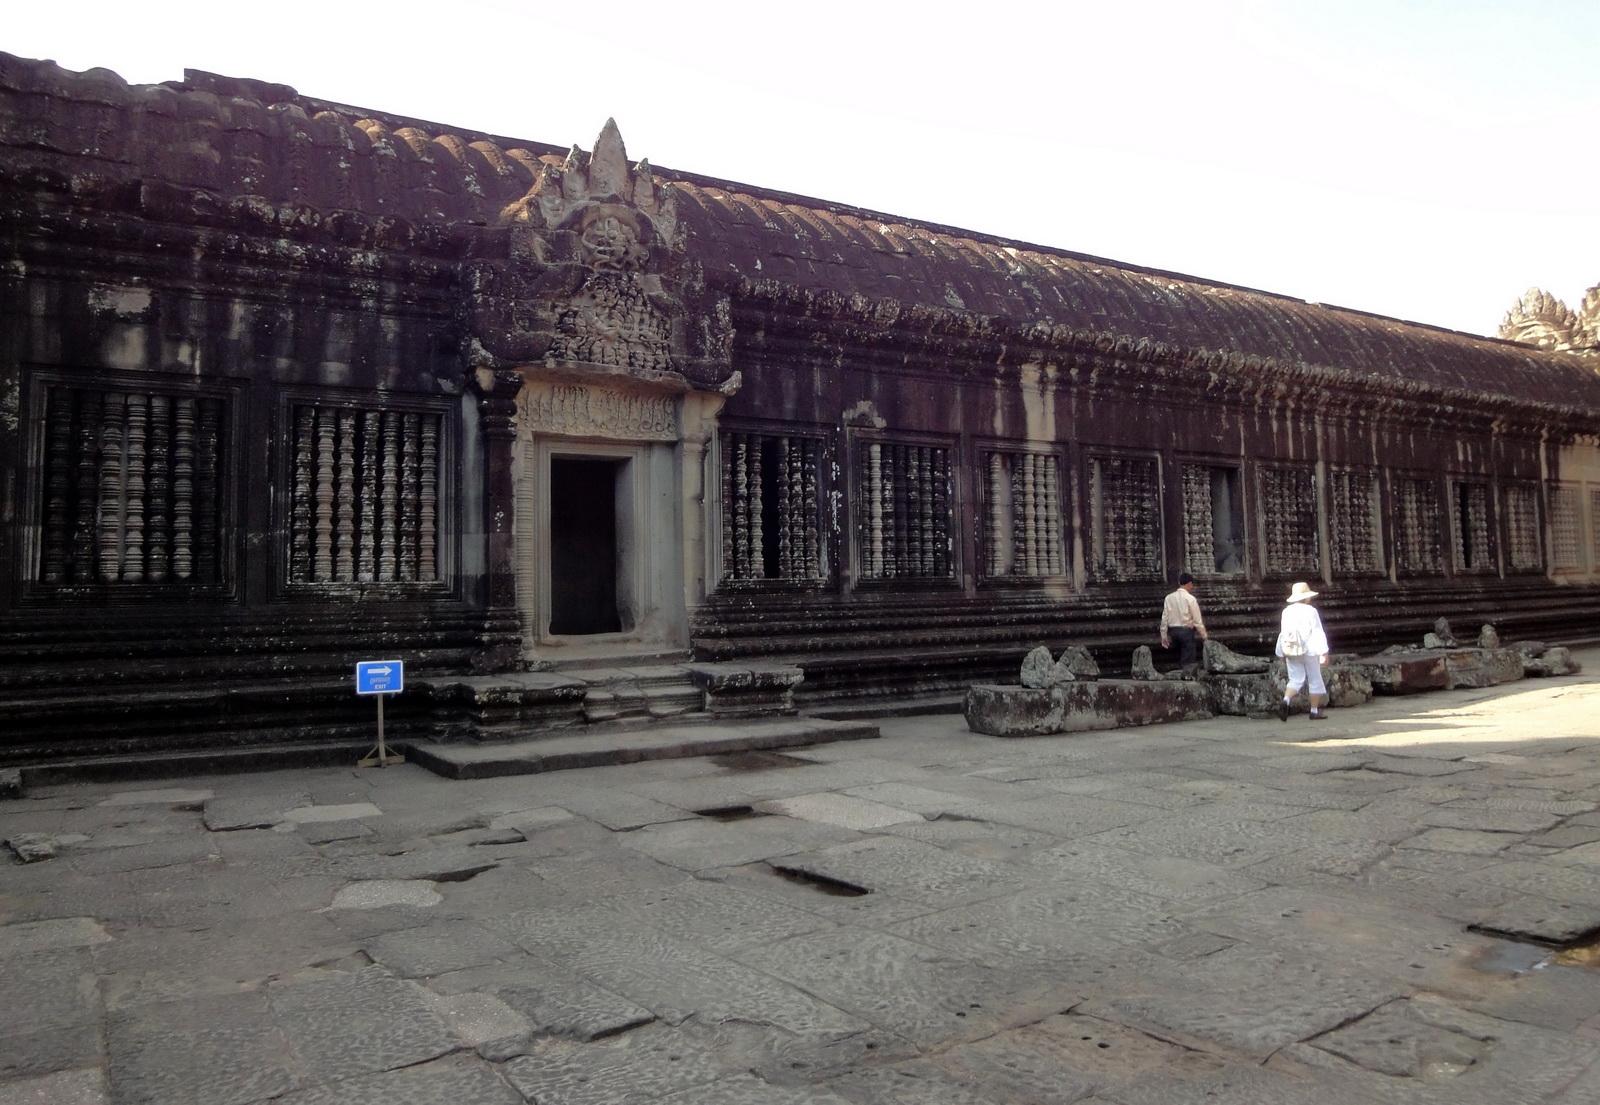 Angkor Wat Khmer architecture inner sanctuary courtyard 01